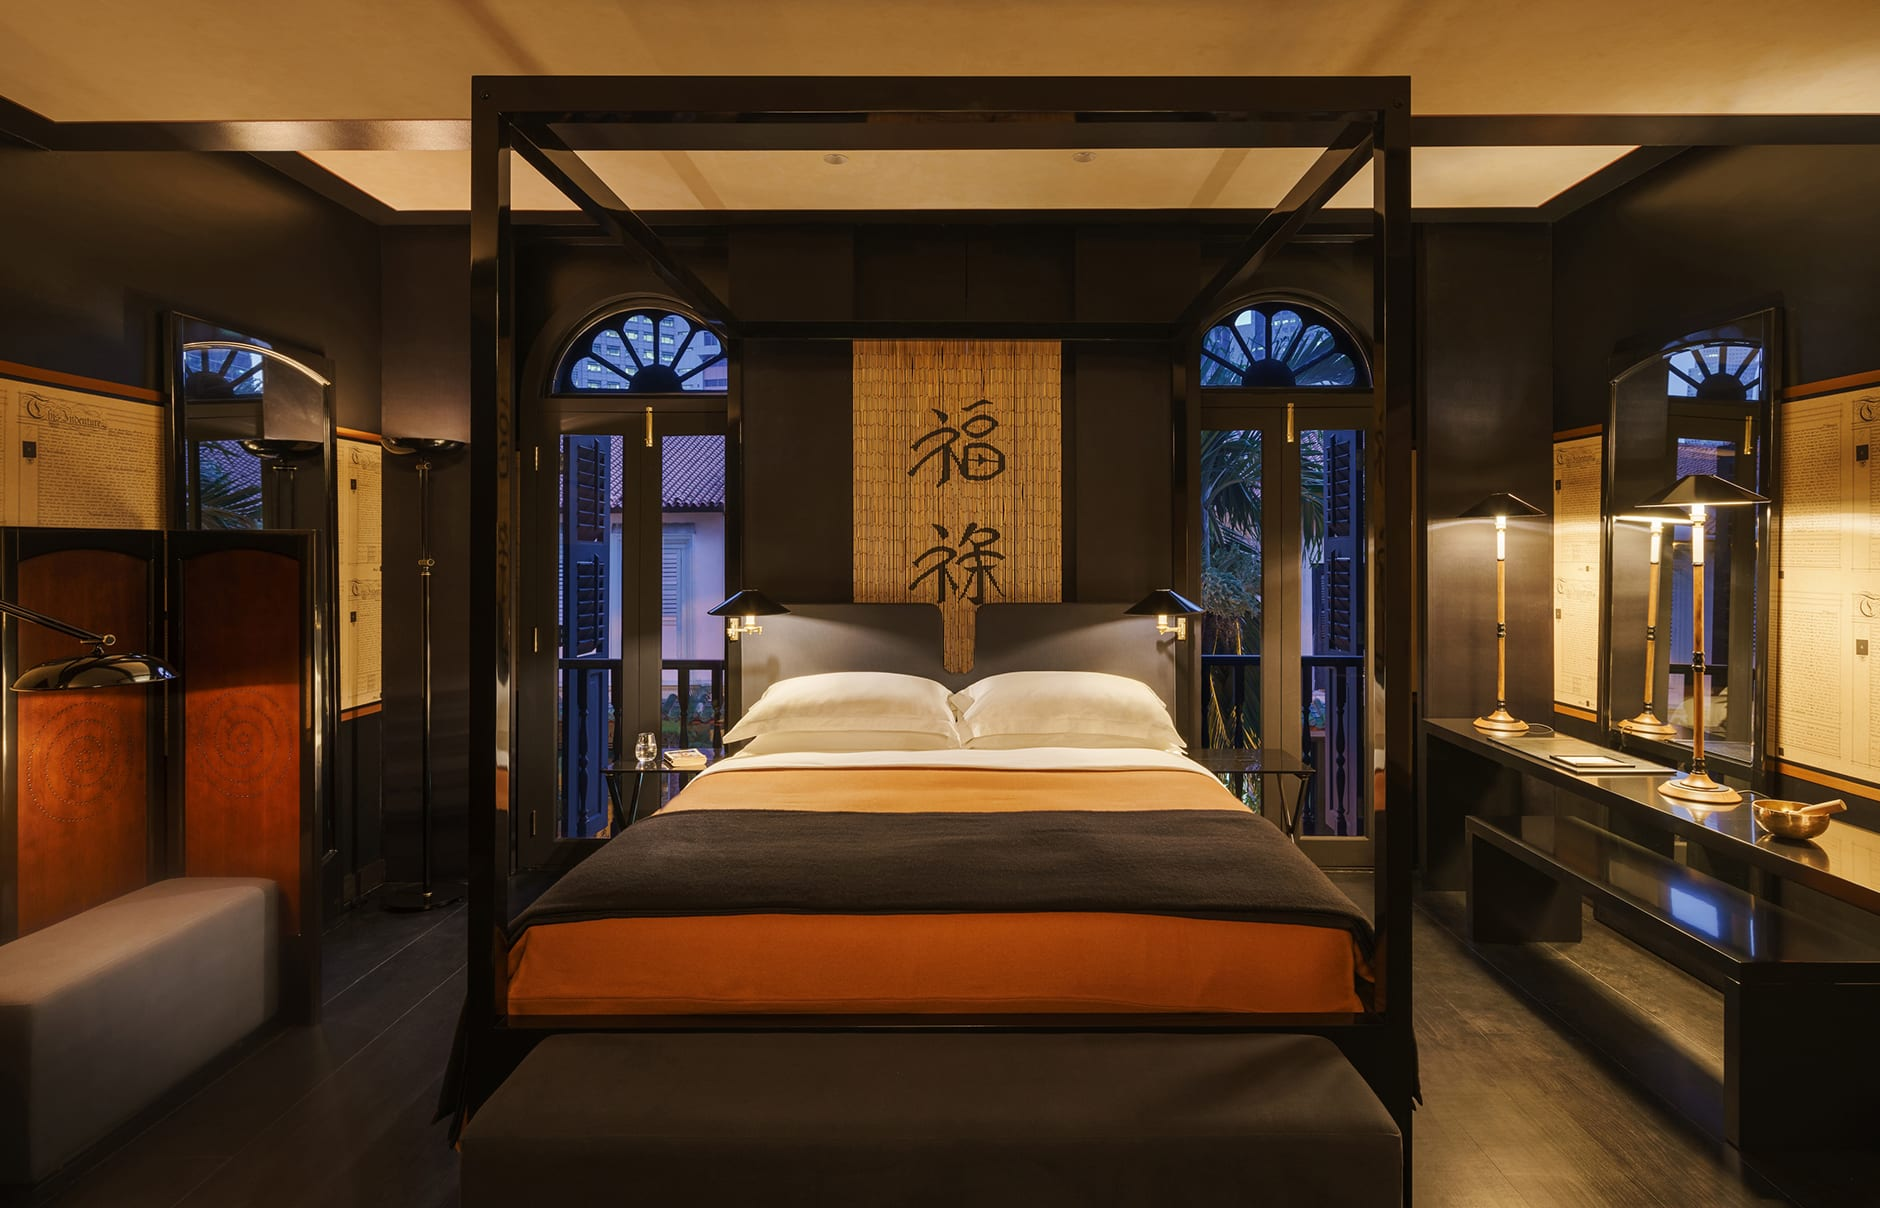 Six Senses Duxton, Singapore. Opium Room. Luxury Hotel Review by TravelPlusStyle. Photo © Six Senses Hotels Resorts Spas